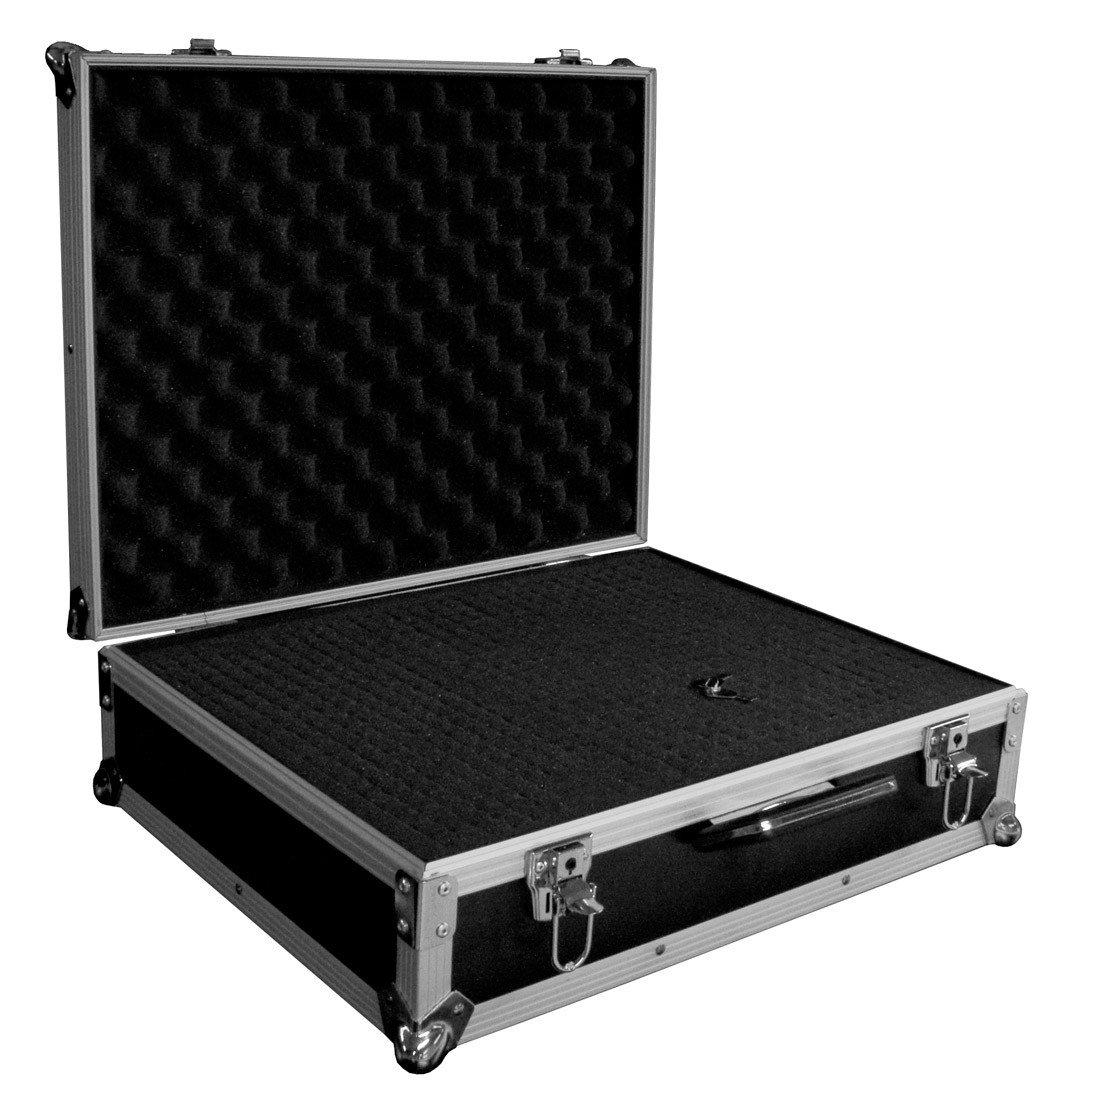 Accu Case Medium Universal Transportation Accessories Case - Black A.D.J. Supply Europe B.V ACF-SW/AC